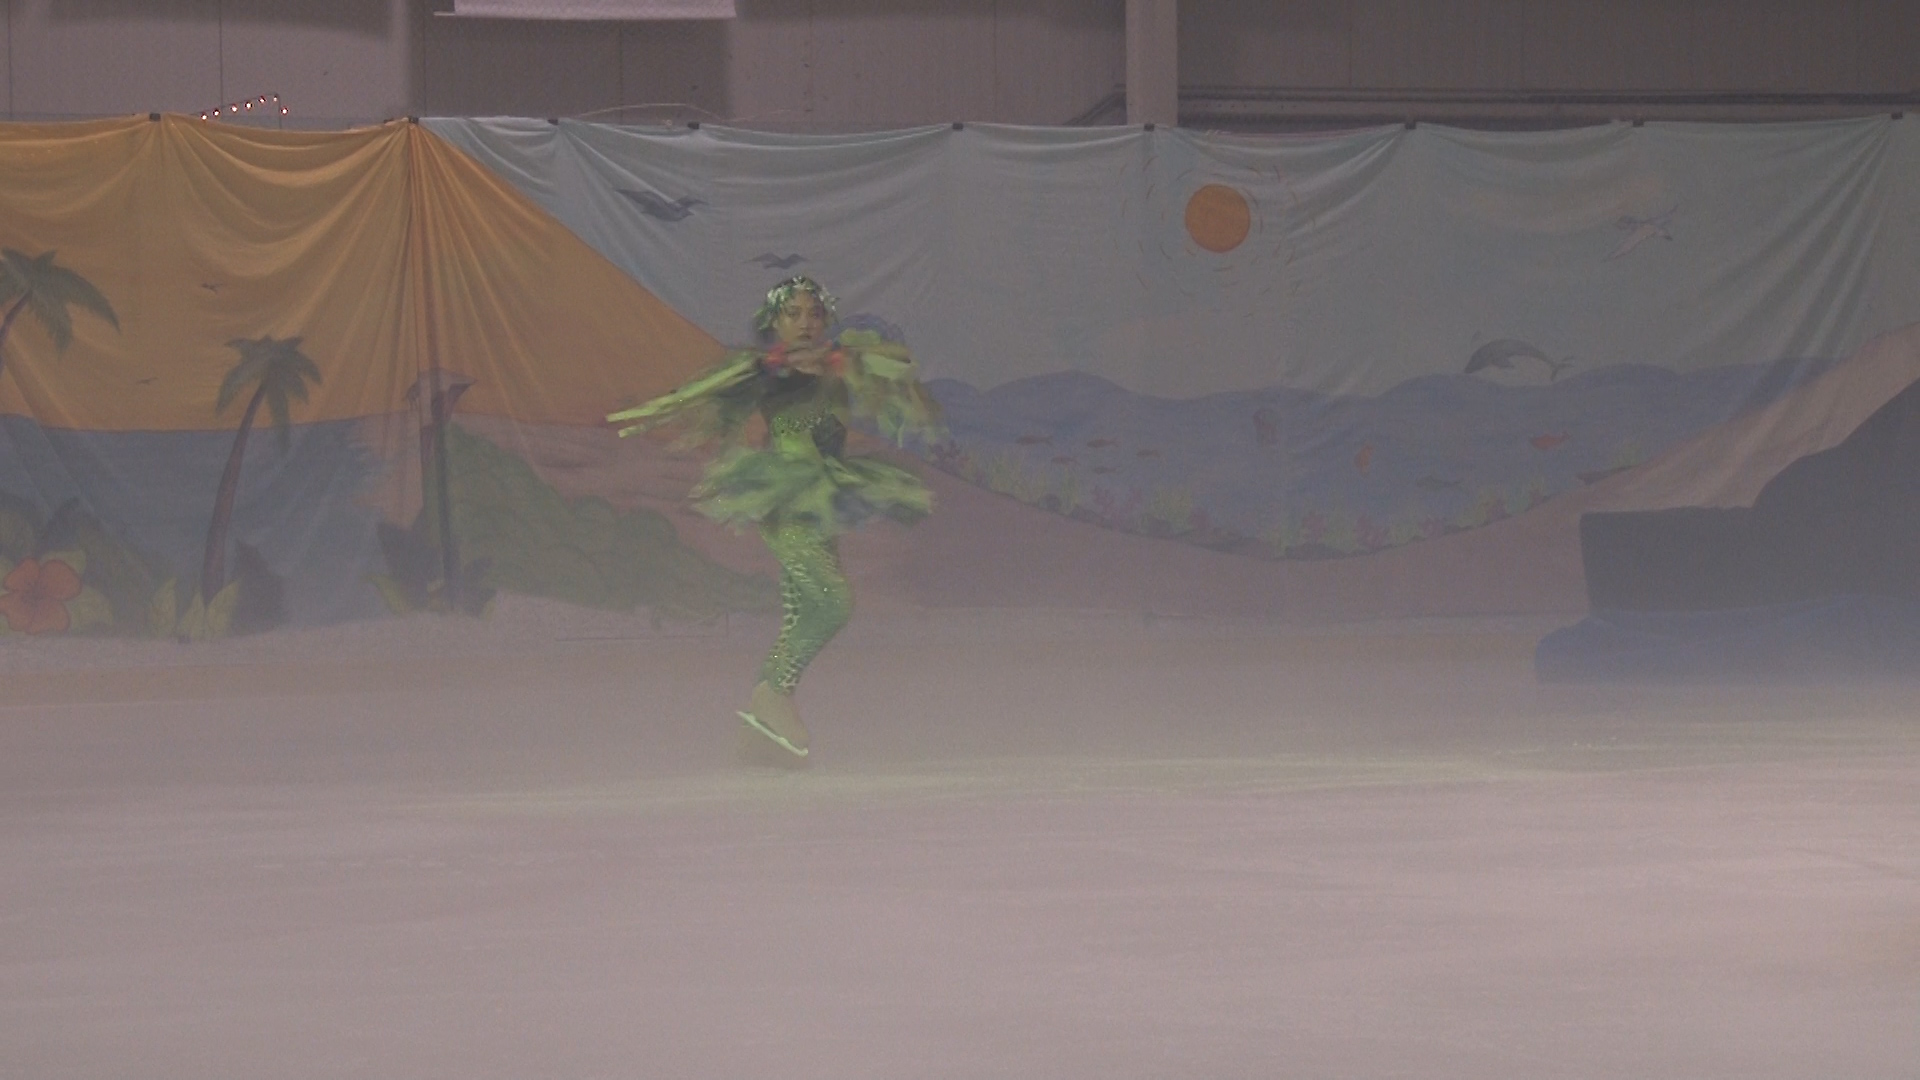 Power Play Maui Skate on Ice 071417.00_52_29_03.Still079.jpg